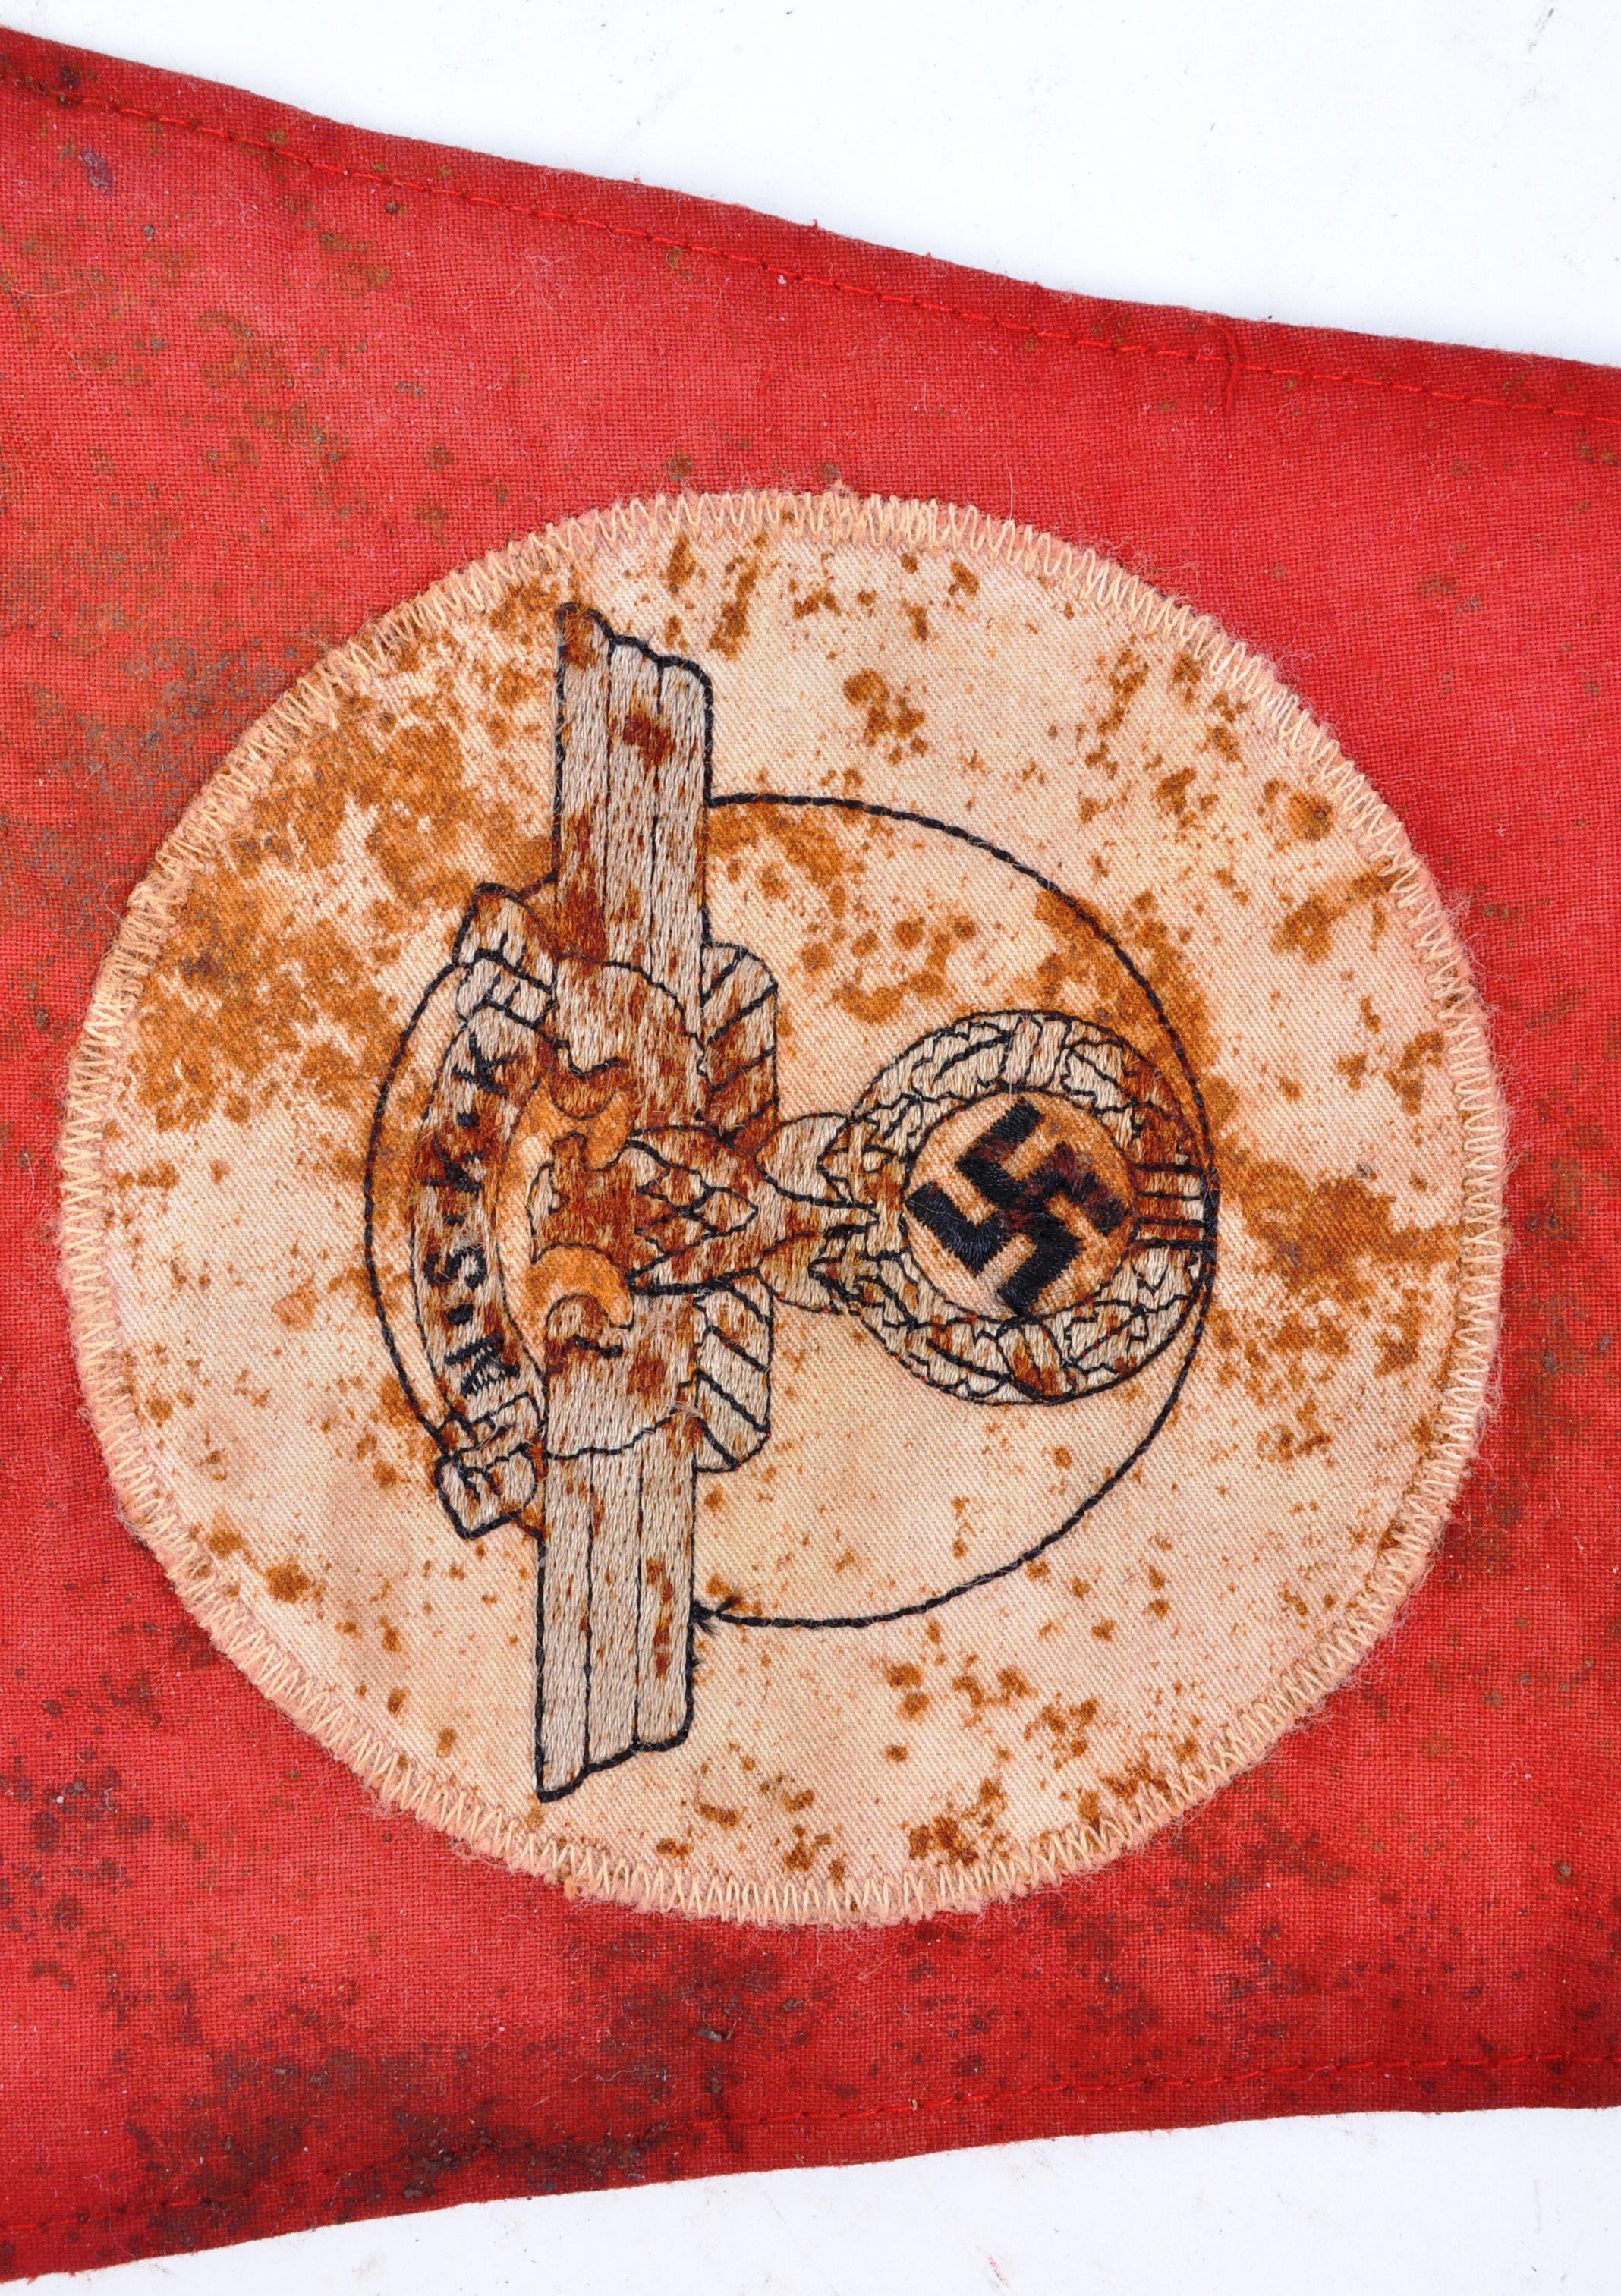 WWII SECOND WORLD WAR GERMAN THIRD REICH VEHICLE PENNANT - Image 2 of 5